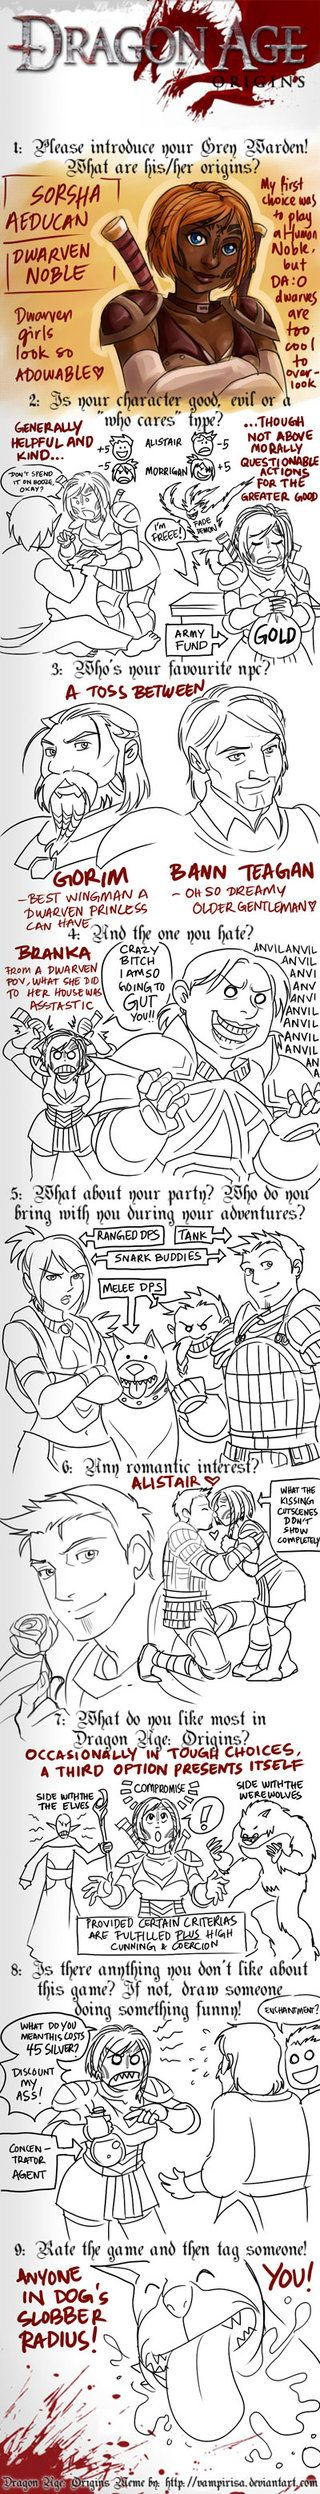 Dragon Age: Origins MeMe by aimo on deviantART